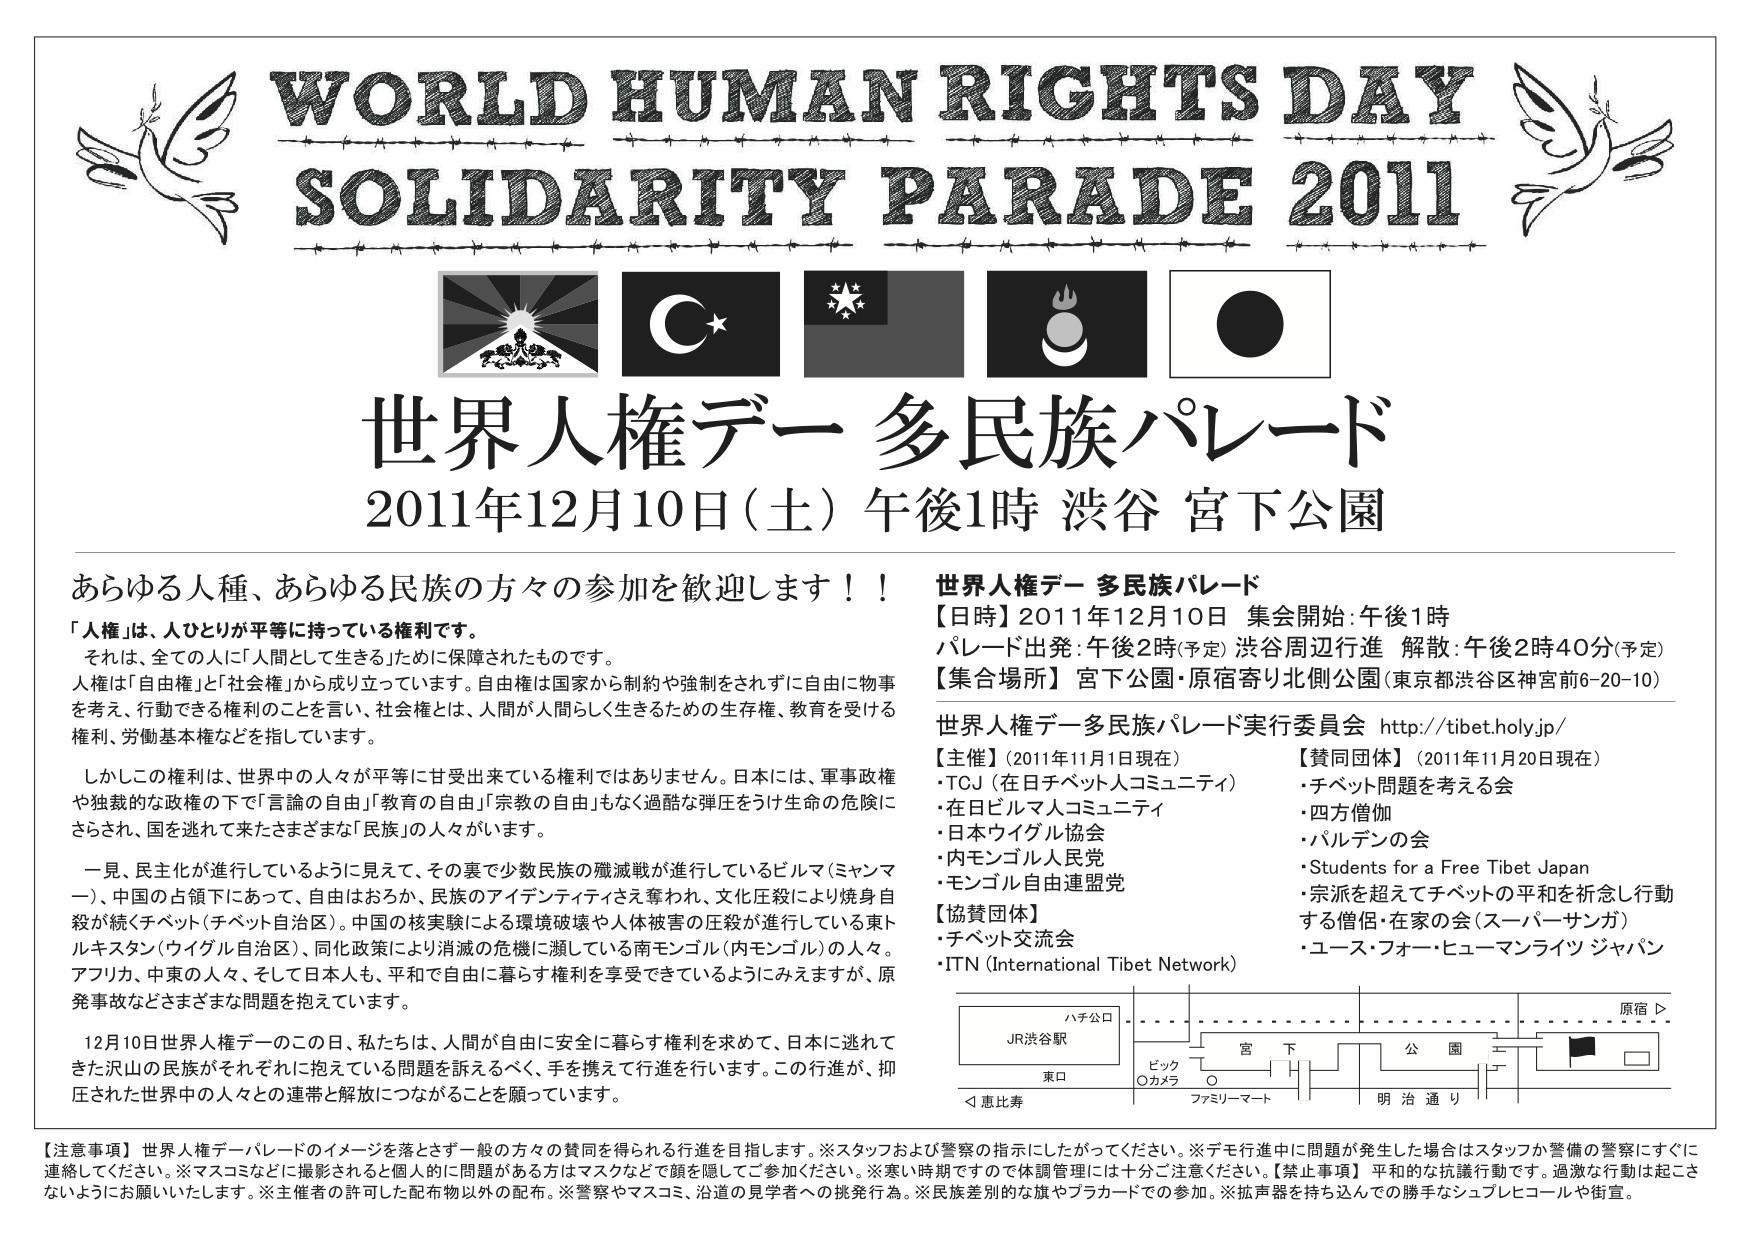 humanrightsday_112526_04.jpg